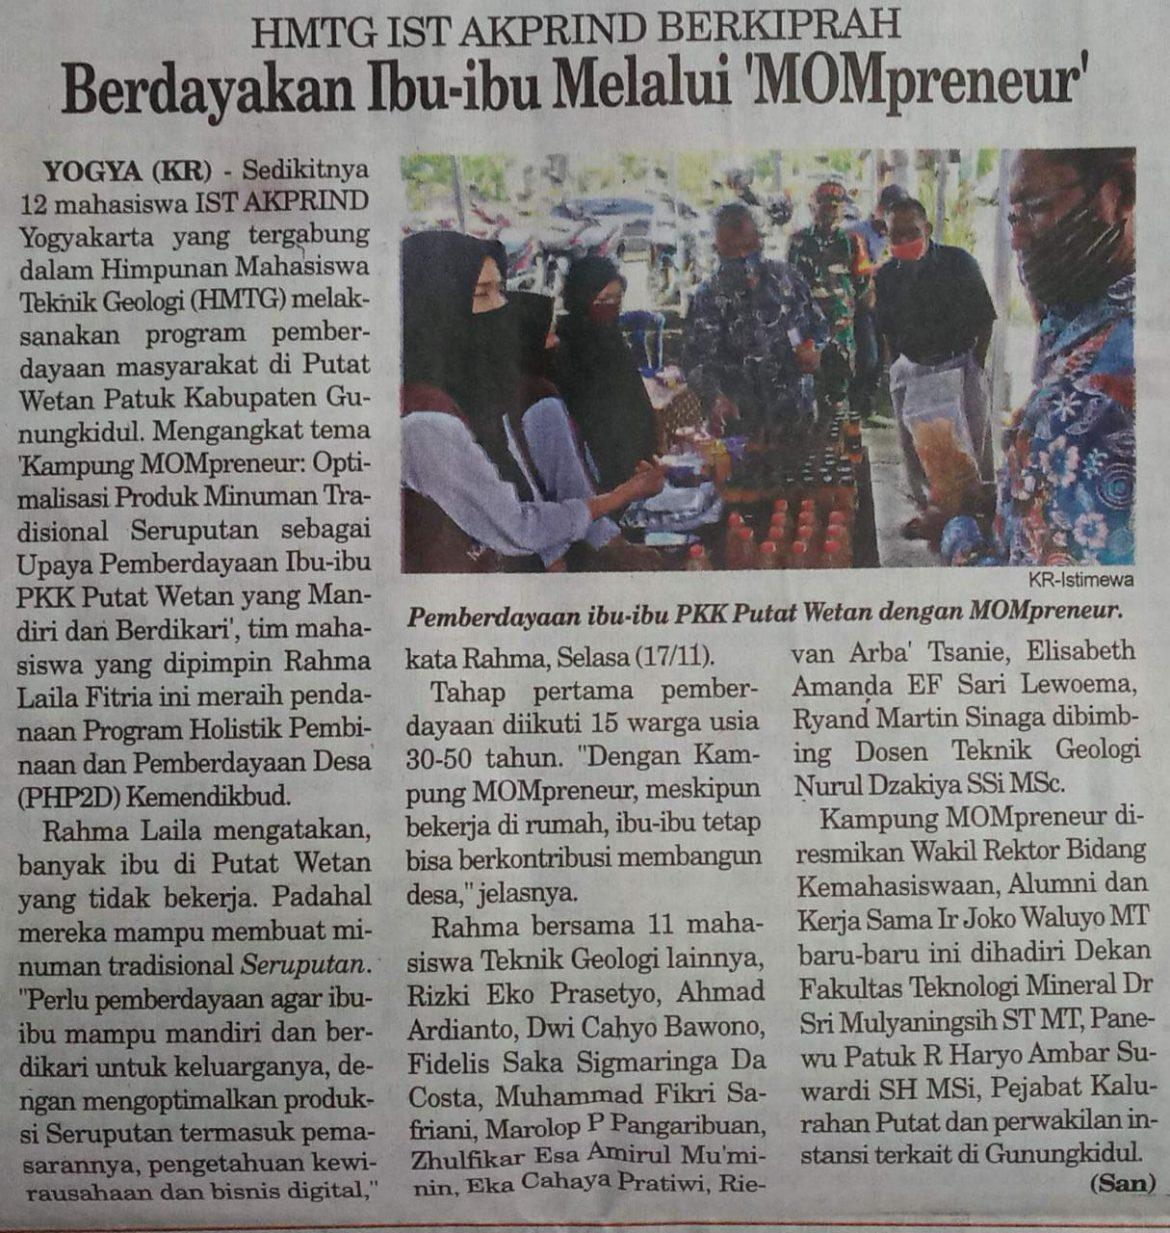 HMTG IST AKPRIND Yogyakarta BERKIPRAH